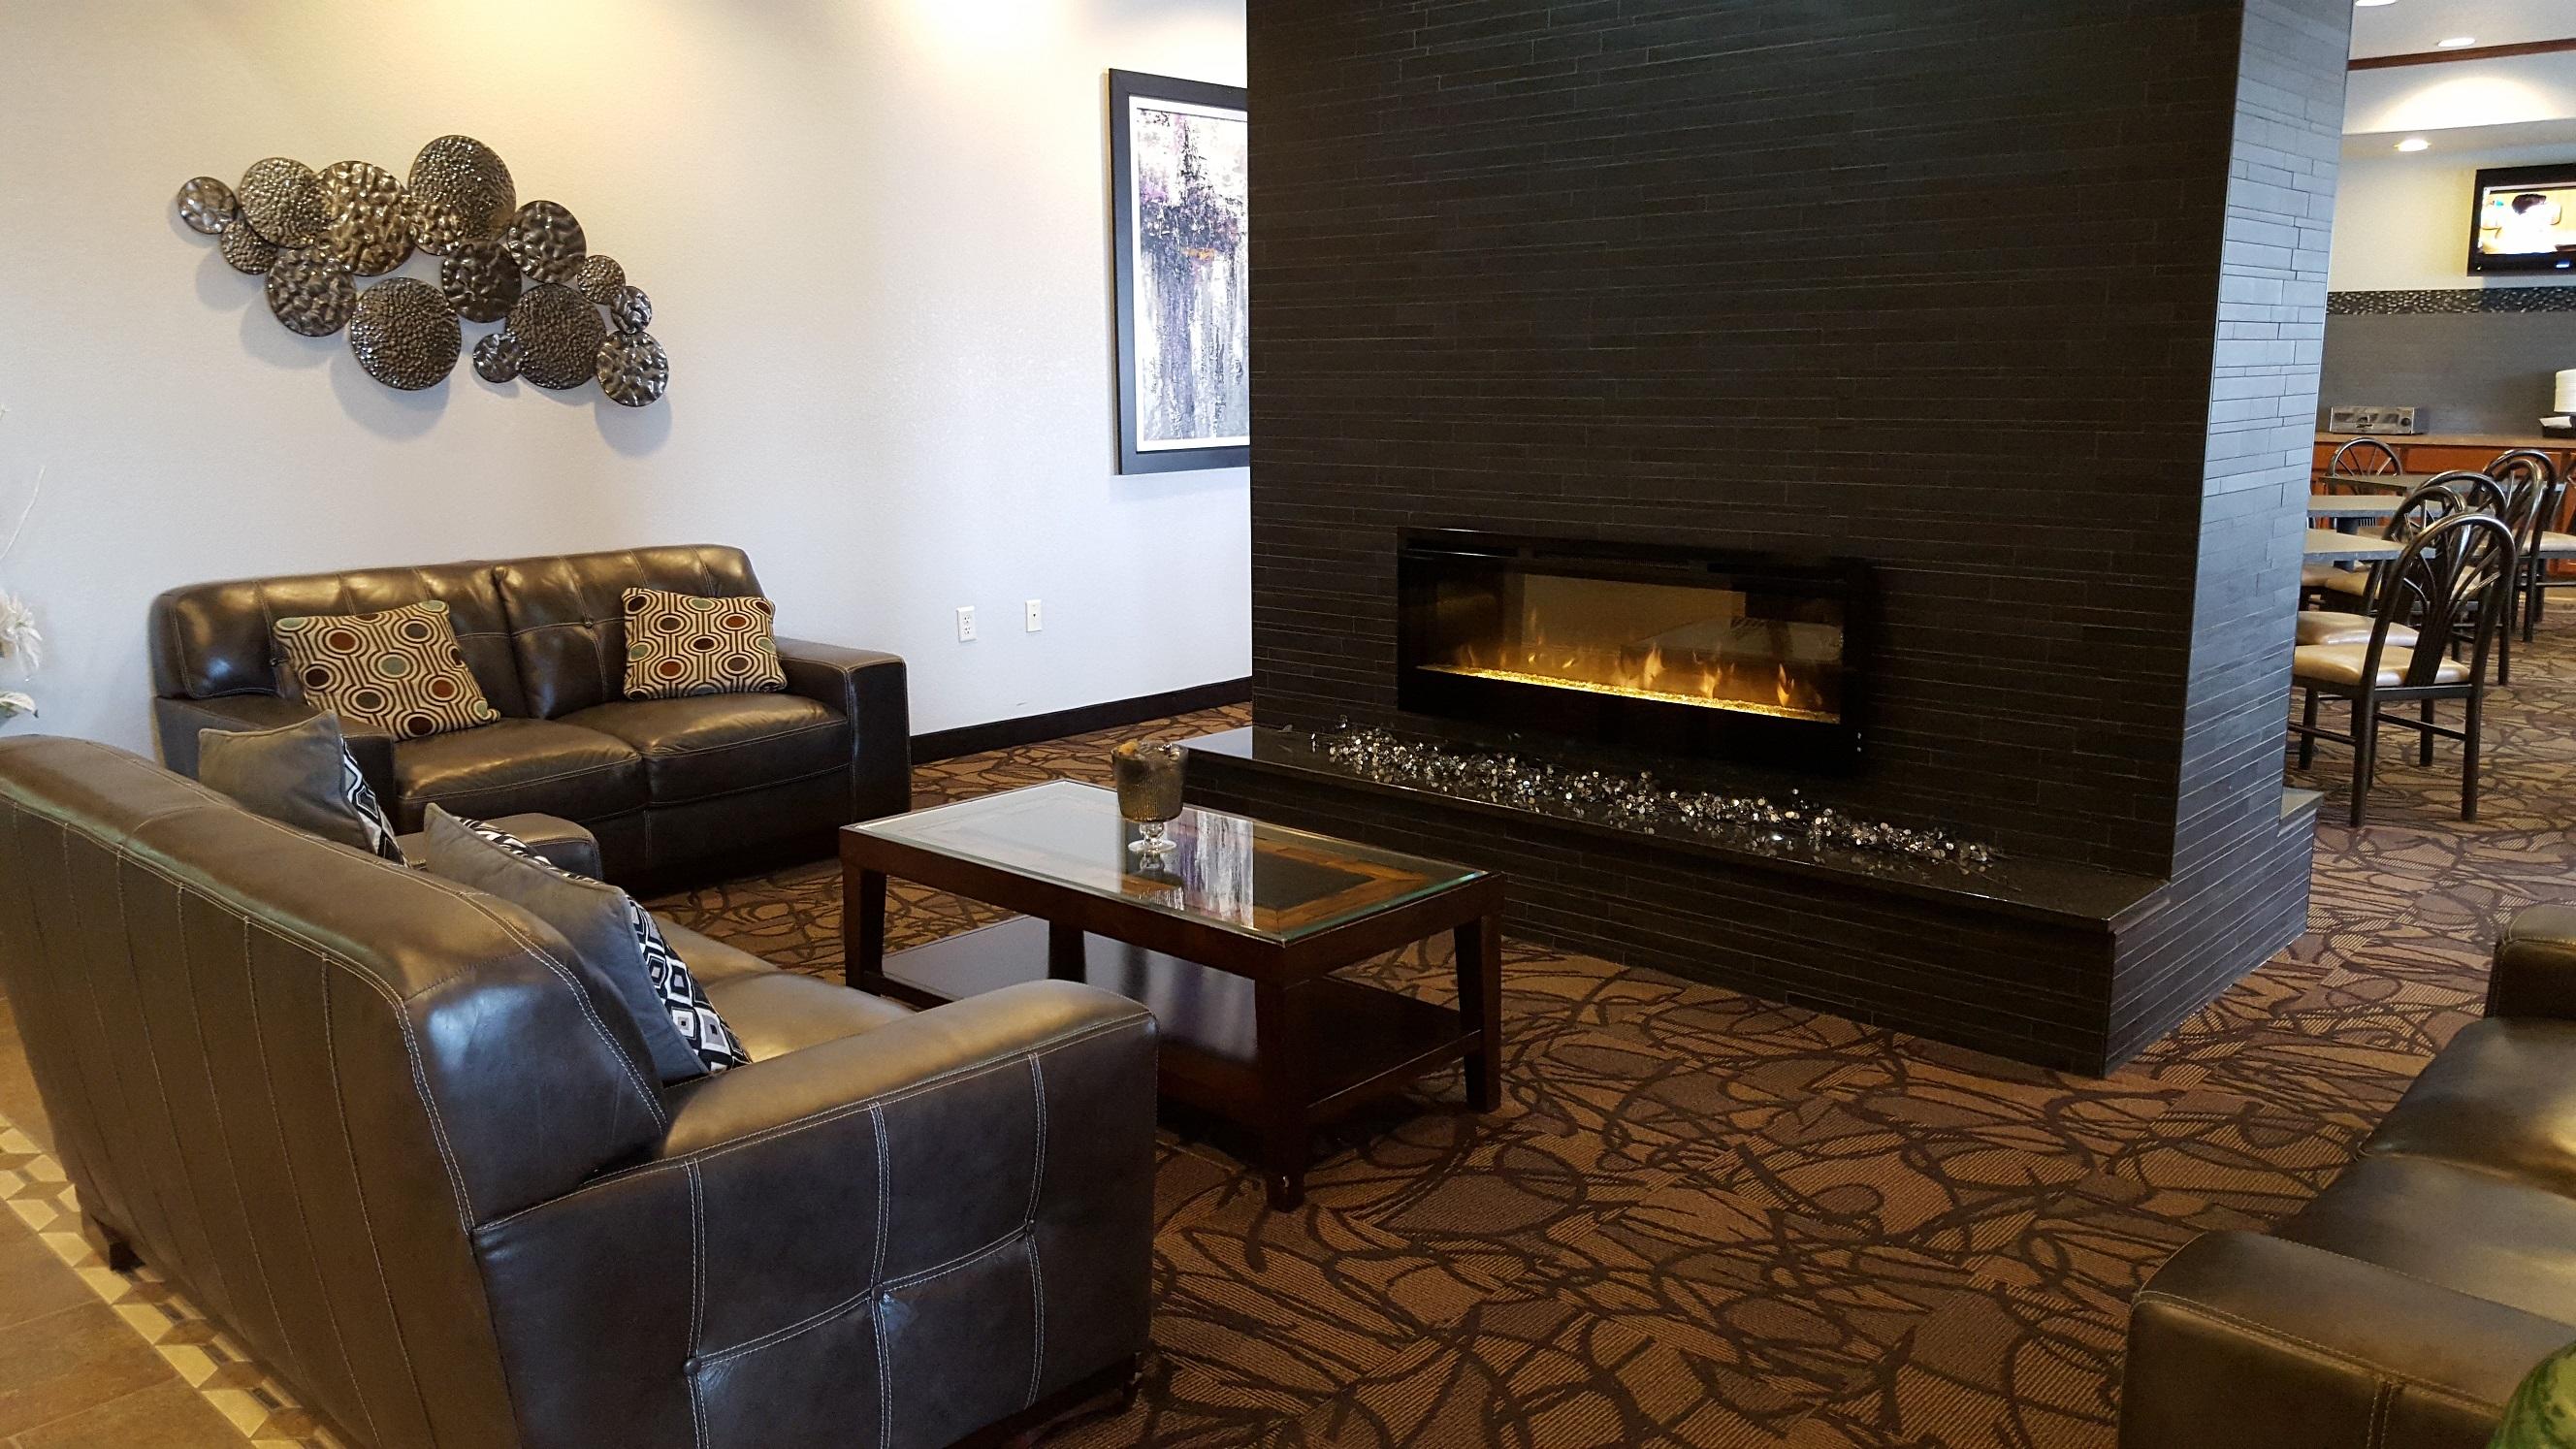 Expressway Suites of Fargo